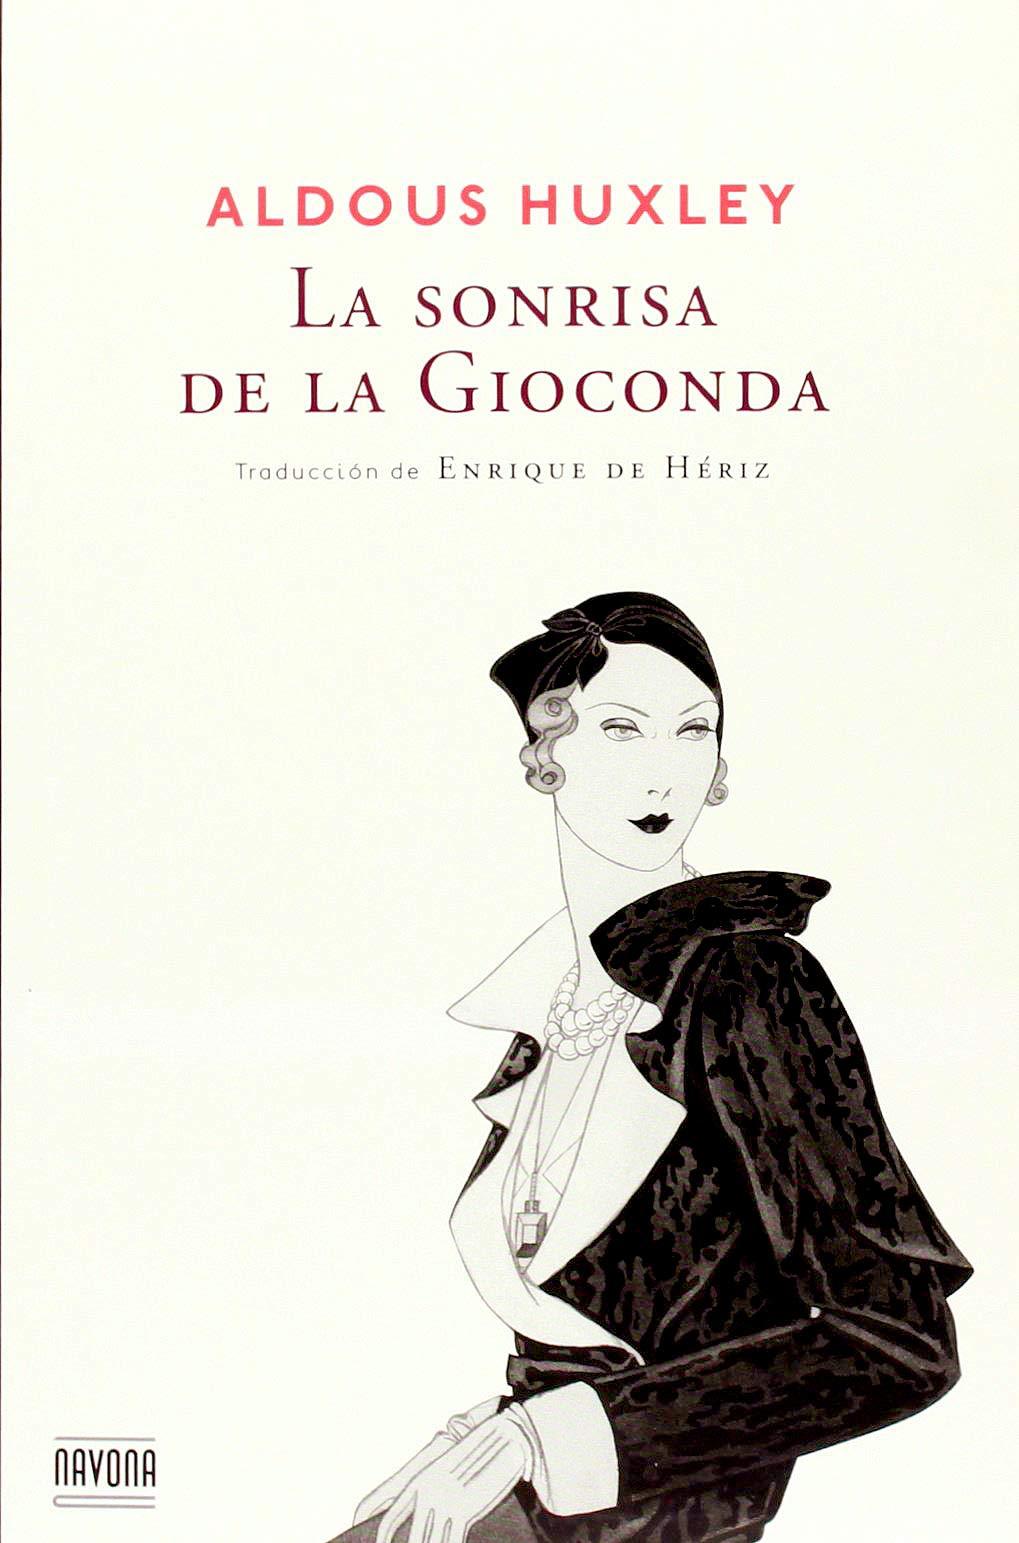 La Sonrisa De La Gioconda Navona Ficciones Spanish Edition Huxley Aldous 9788492840816 Books